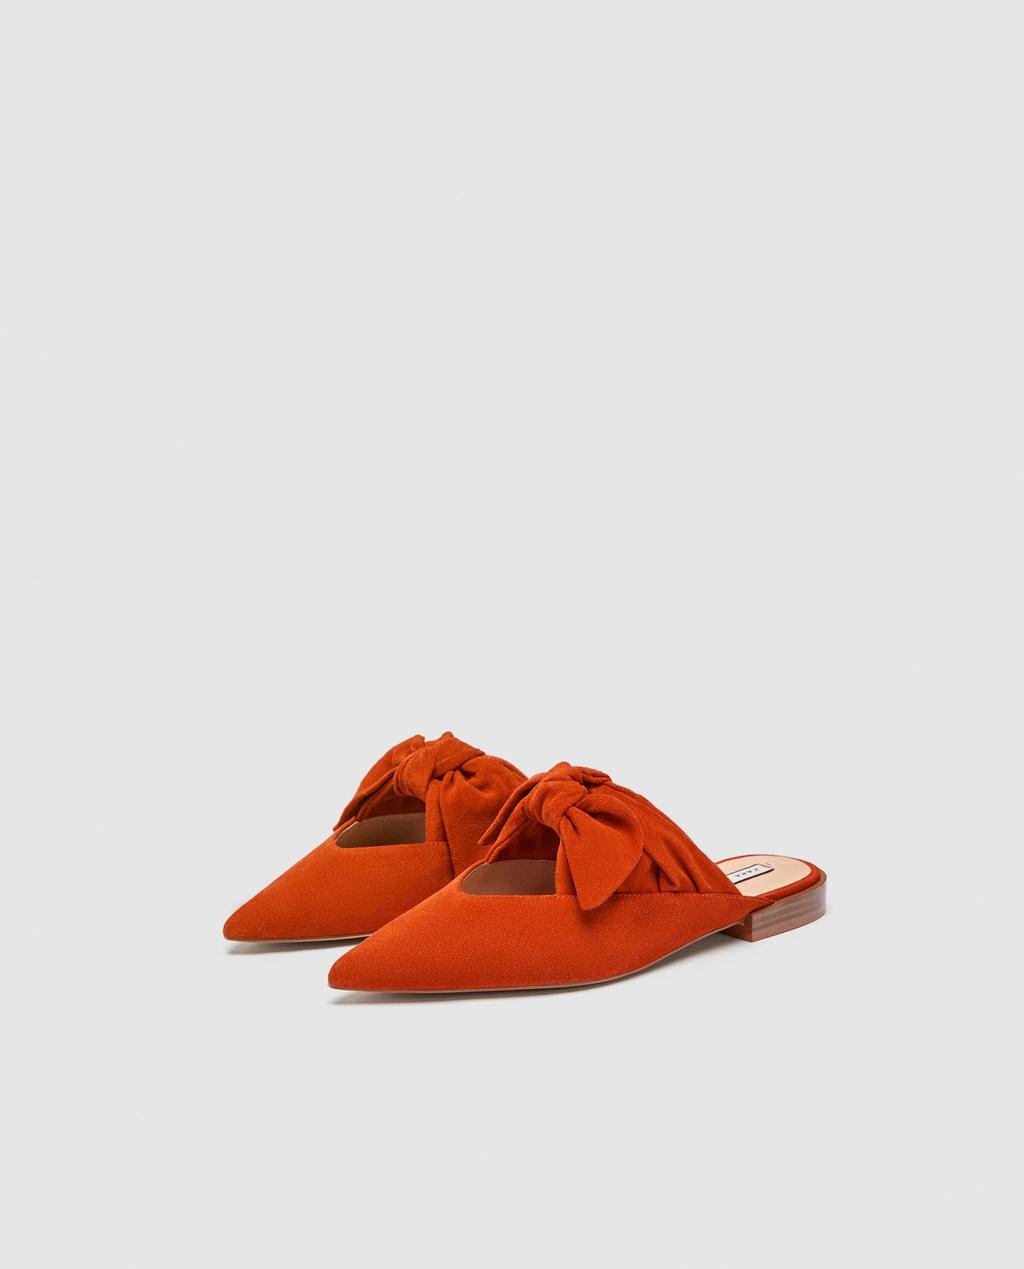 https://www.zara.com/ca/en/leather-mules-with-bow-detail-p13534301.html?v1=5970528&v2=796015